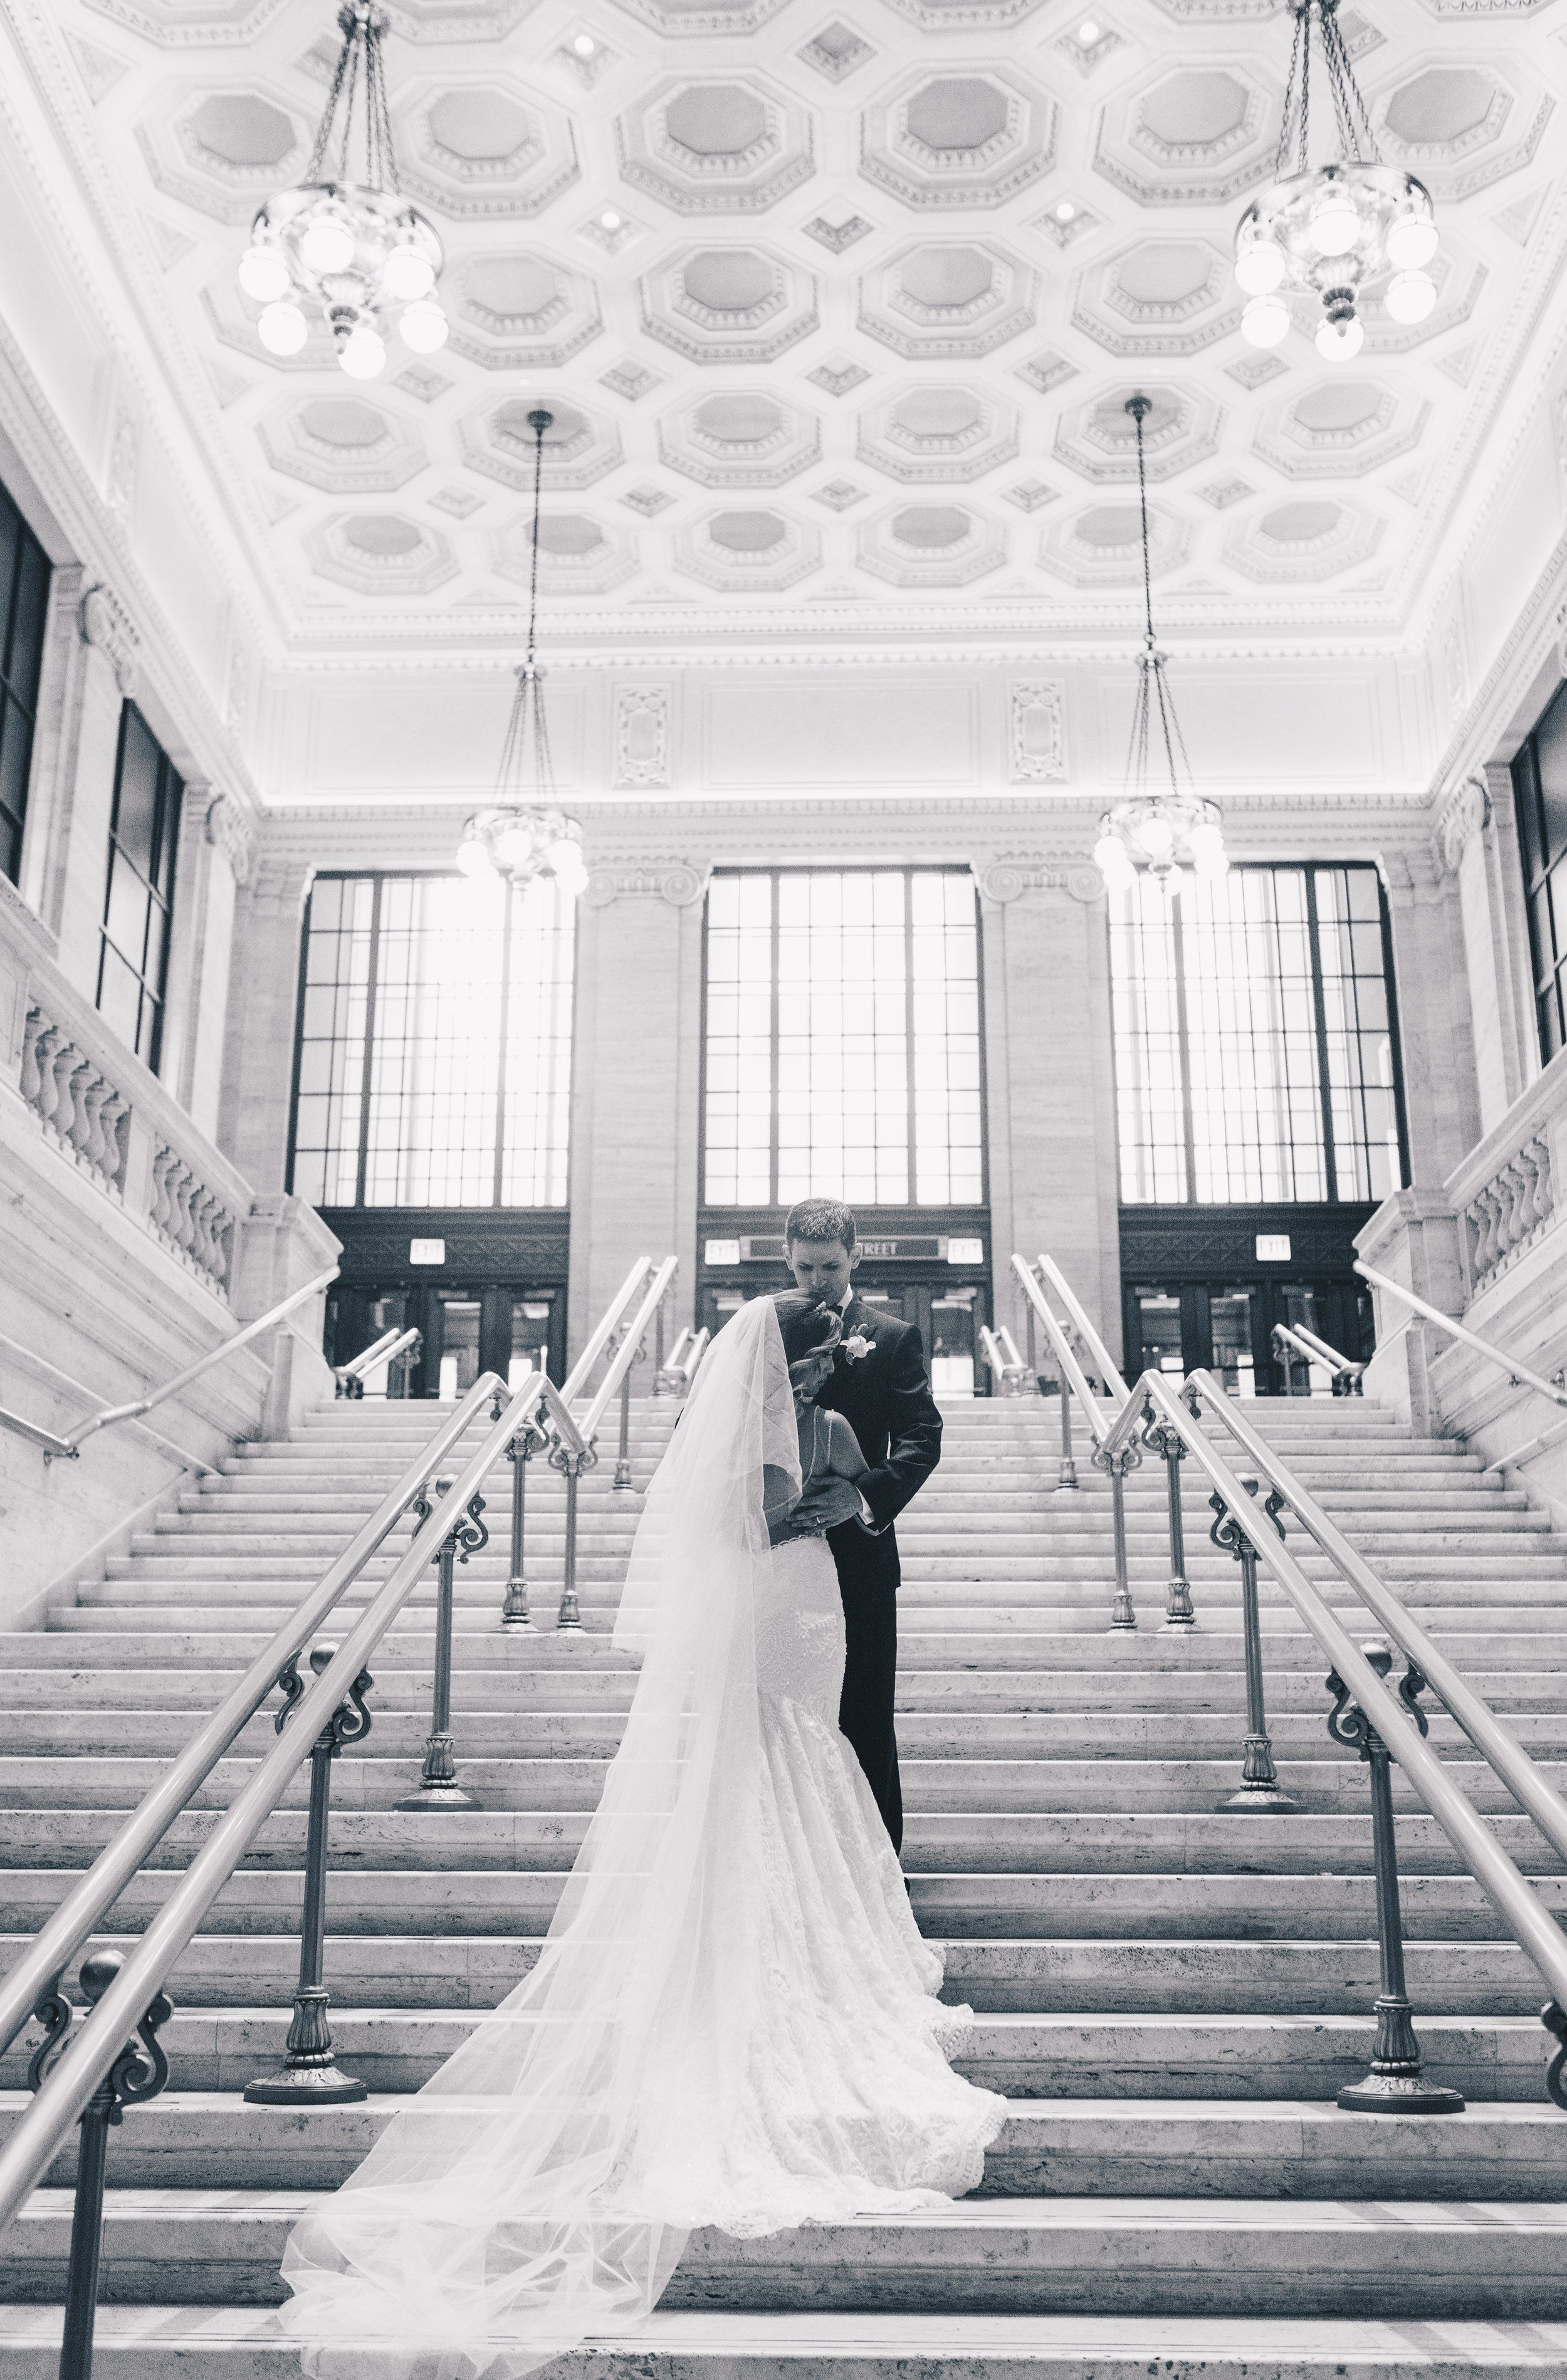 Chicago Bride And Groom Photos Chicago Wedding Chicago Wedding Photographer Chicago Elopement P In 2020 Chicago Wedding Bride And Groom Photos Wedding Photographers